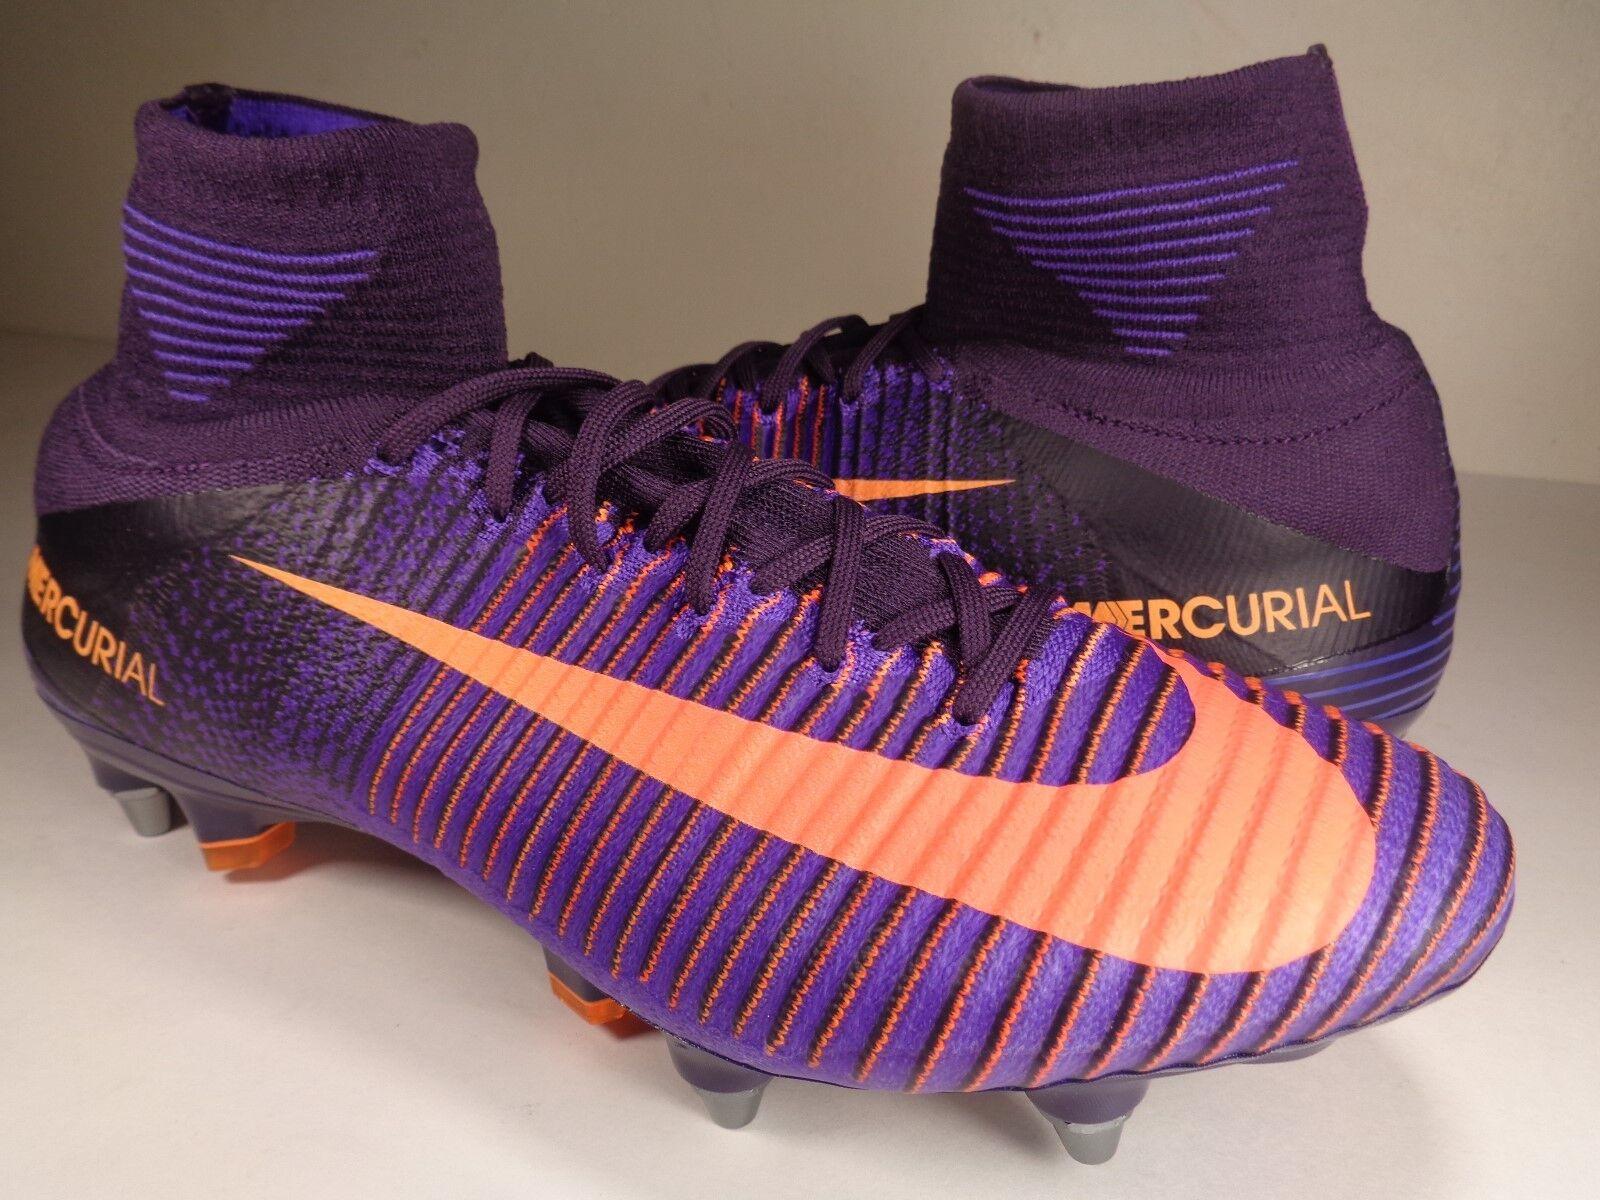 Nike mercurial super / / super sg-pro stollenschuhe lila dynastie sz - 9 (831956-585) 99a184